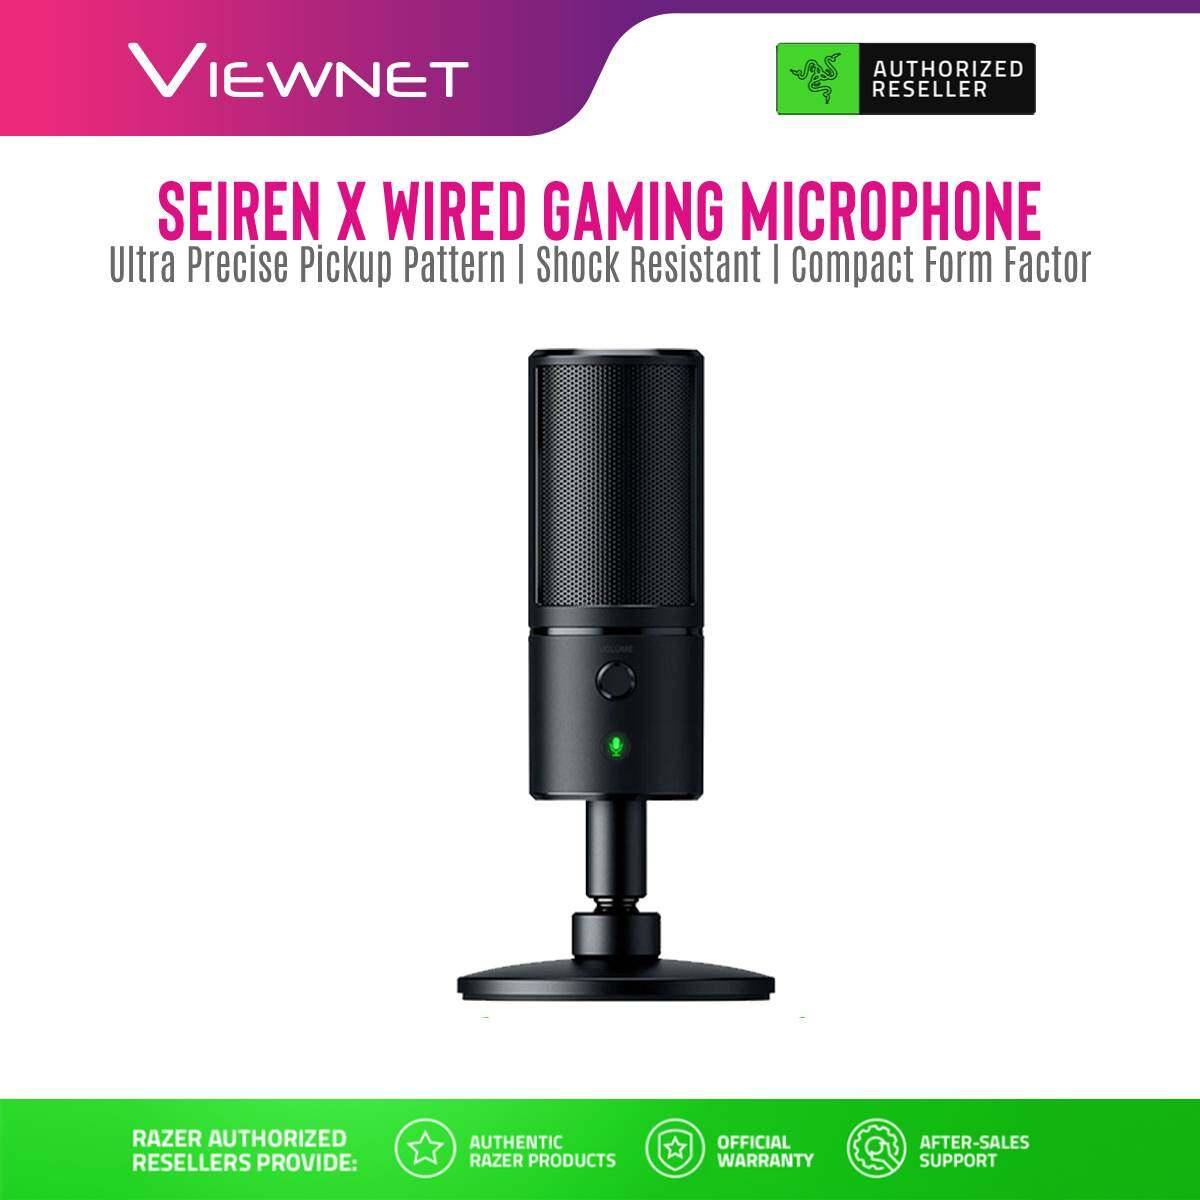 Razer Gaming Microphone Seiren X (Classic Black / Quartz Pink / Mercury White) with Mute Button, Shock Resistant, Ultra-Precise Pickup Pattern